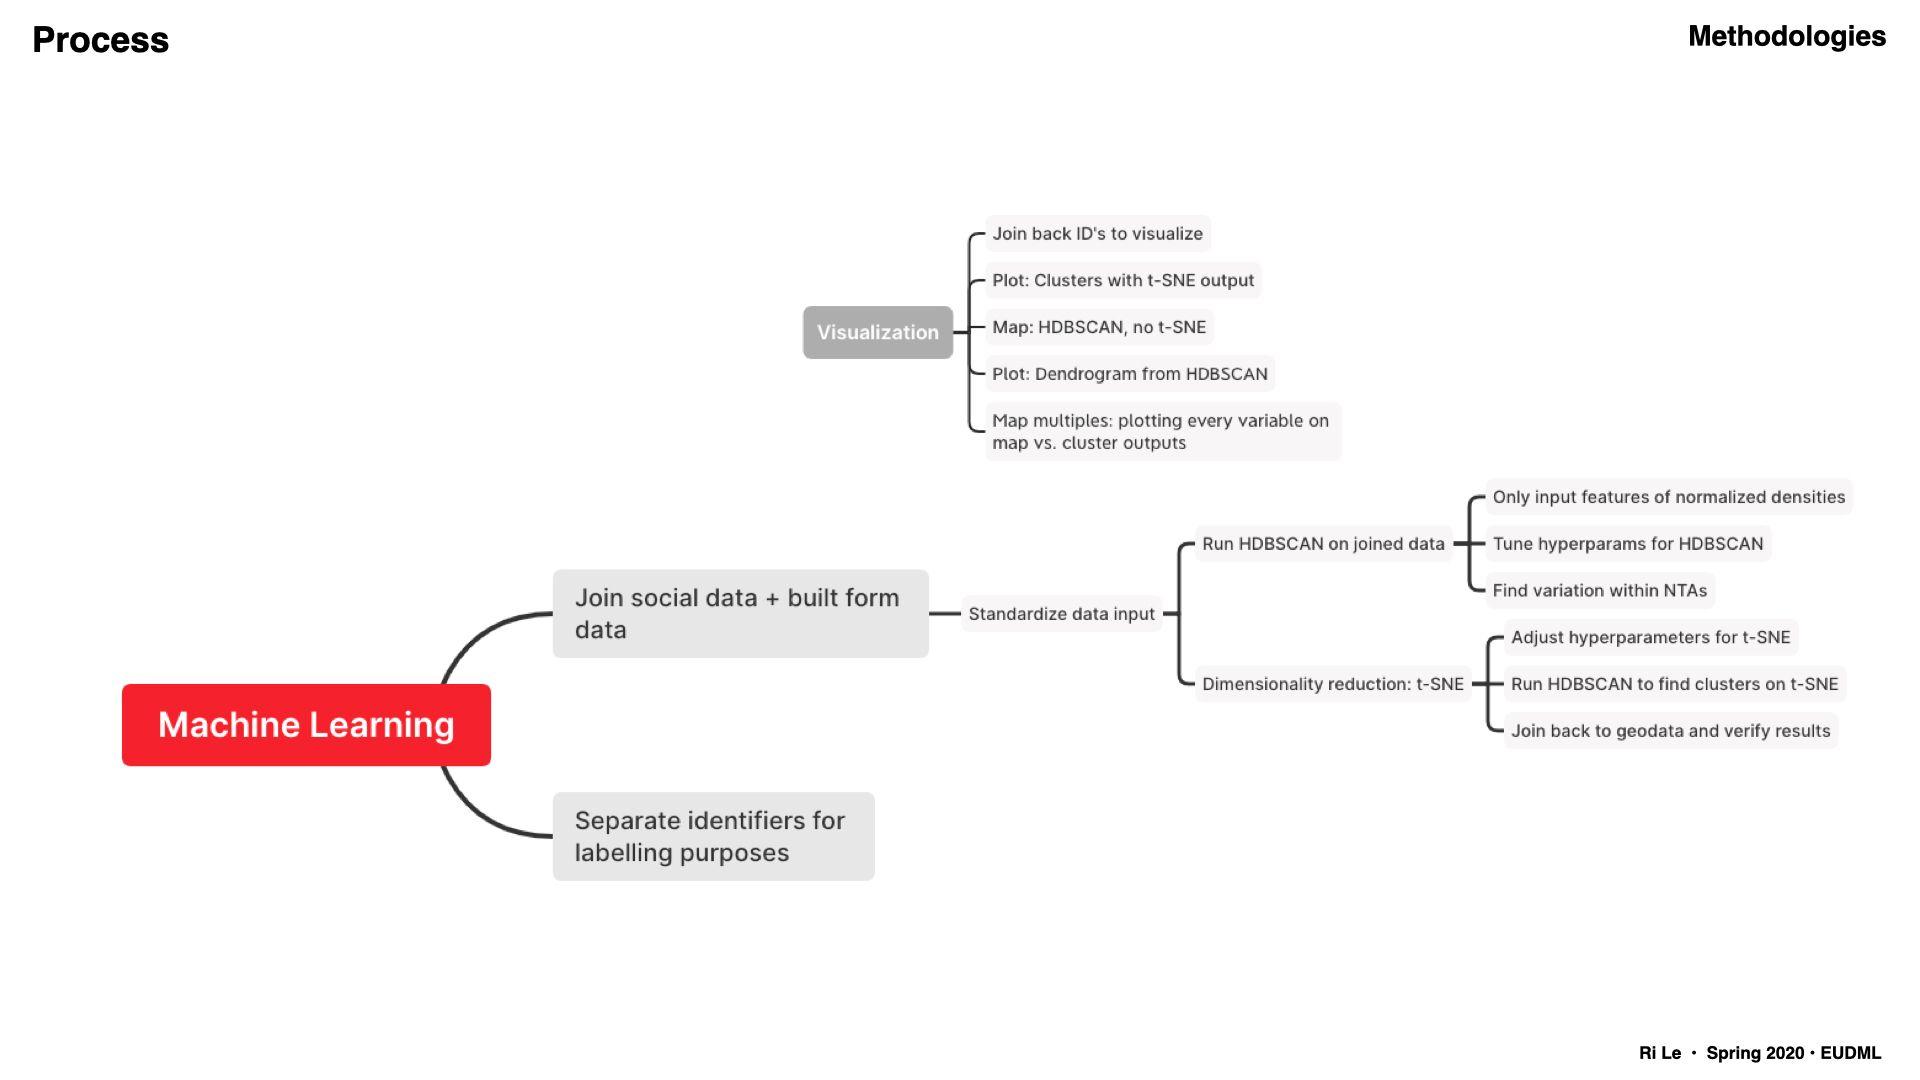 Methodology diagram